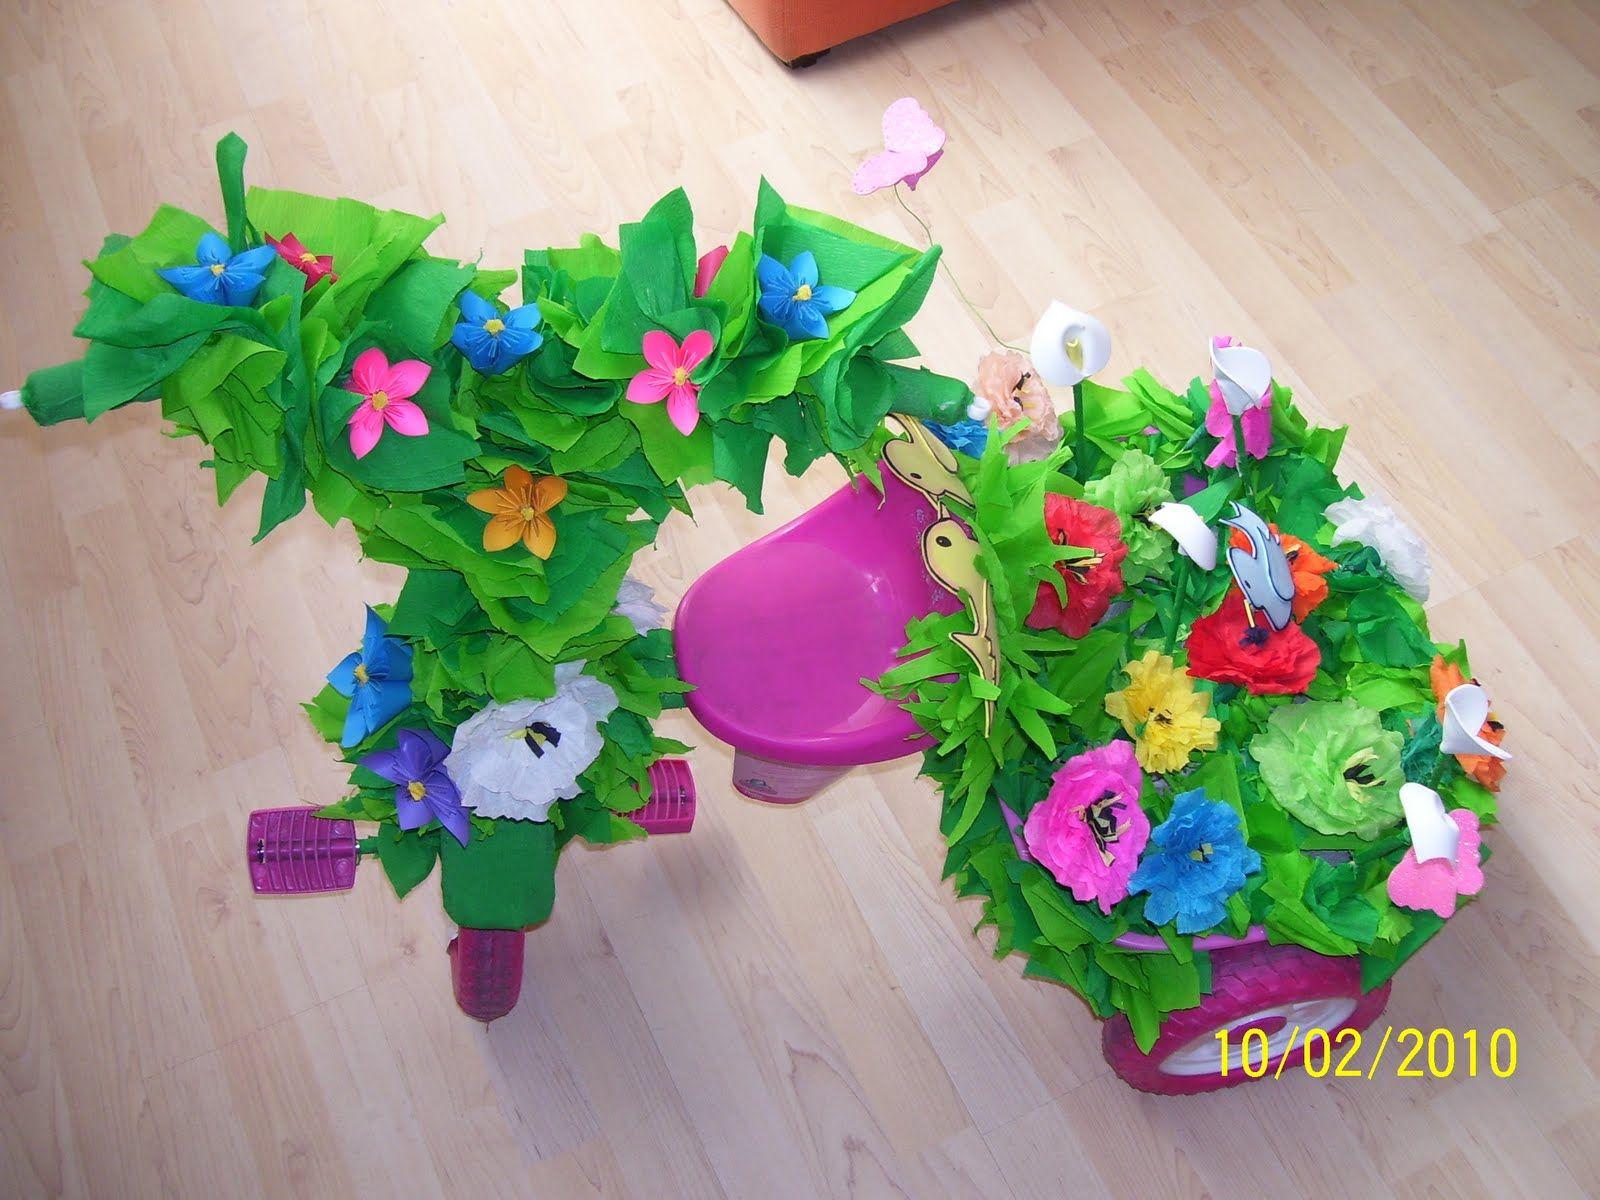 Monys monadas decoraci n de triciclos primavera ni s for Decoracion primavera infantil